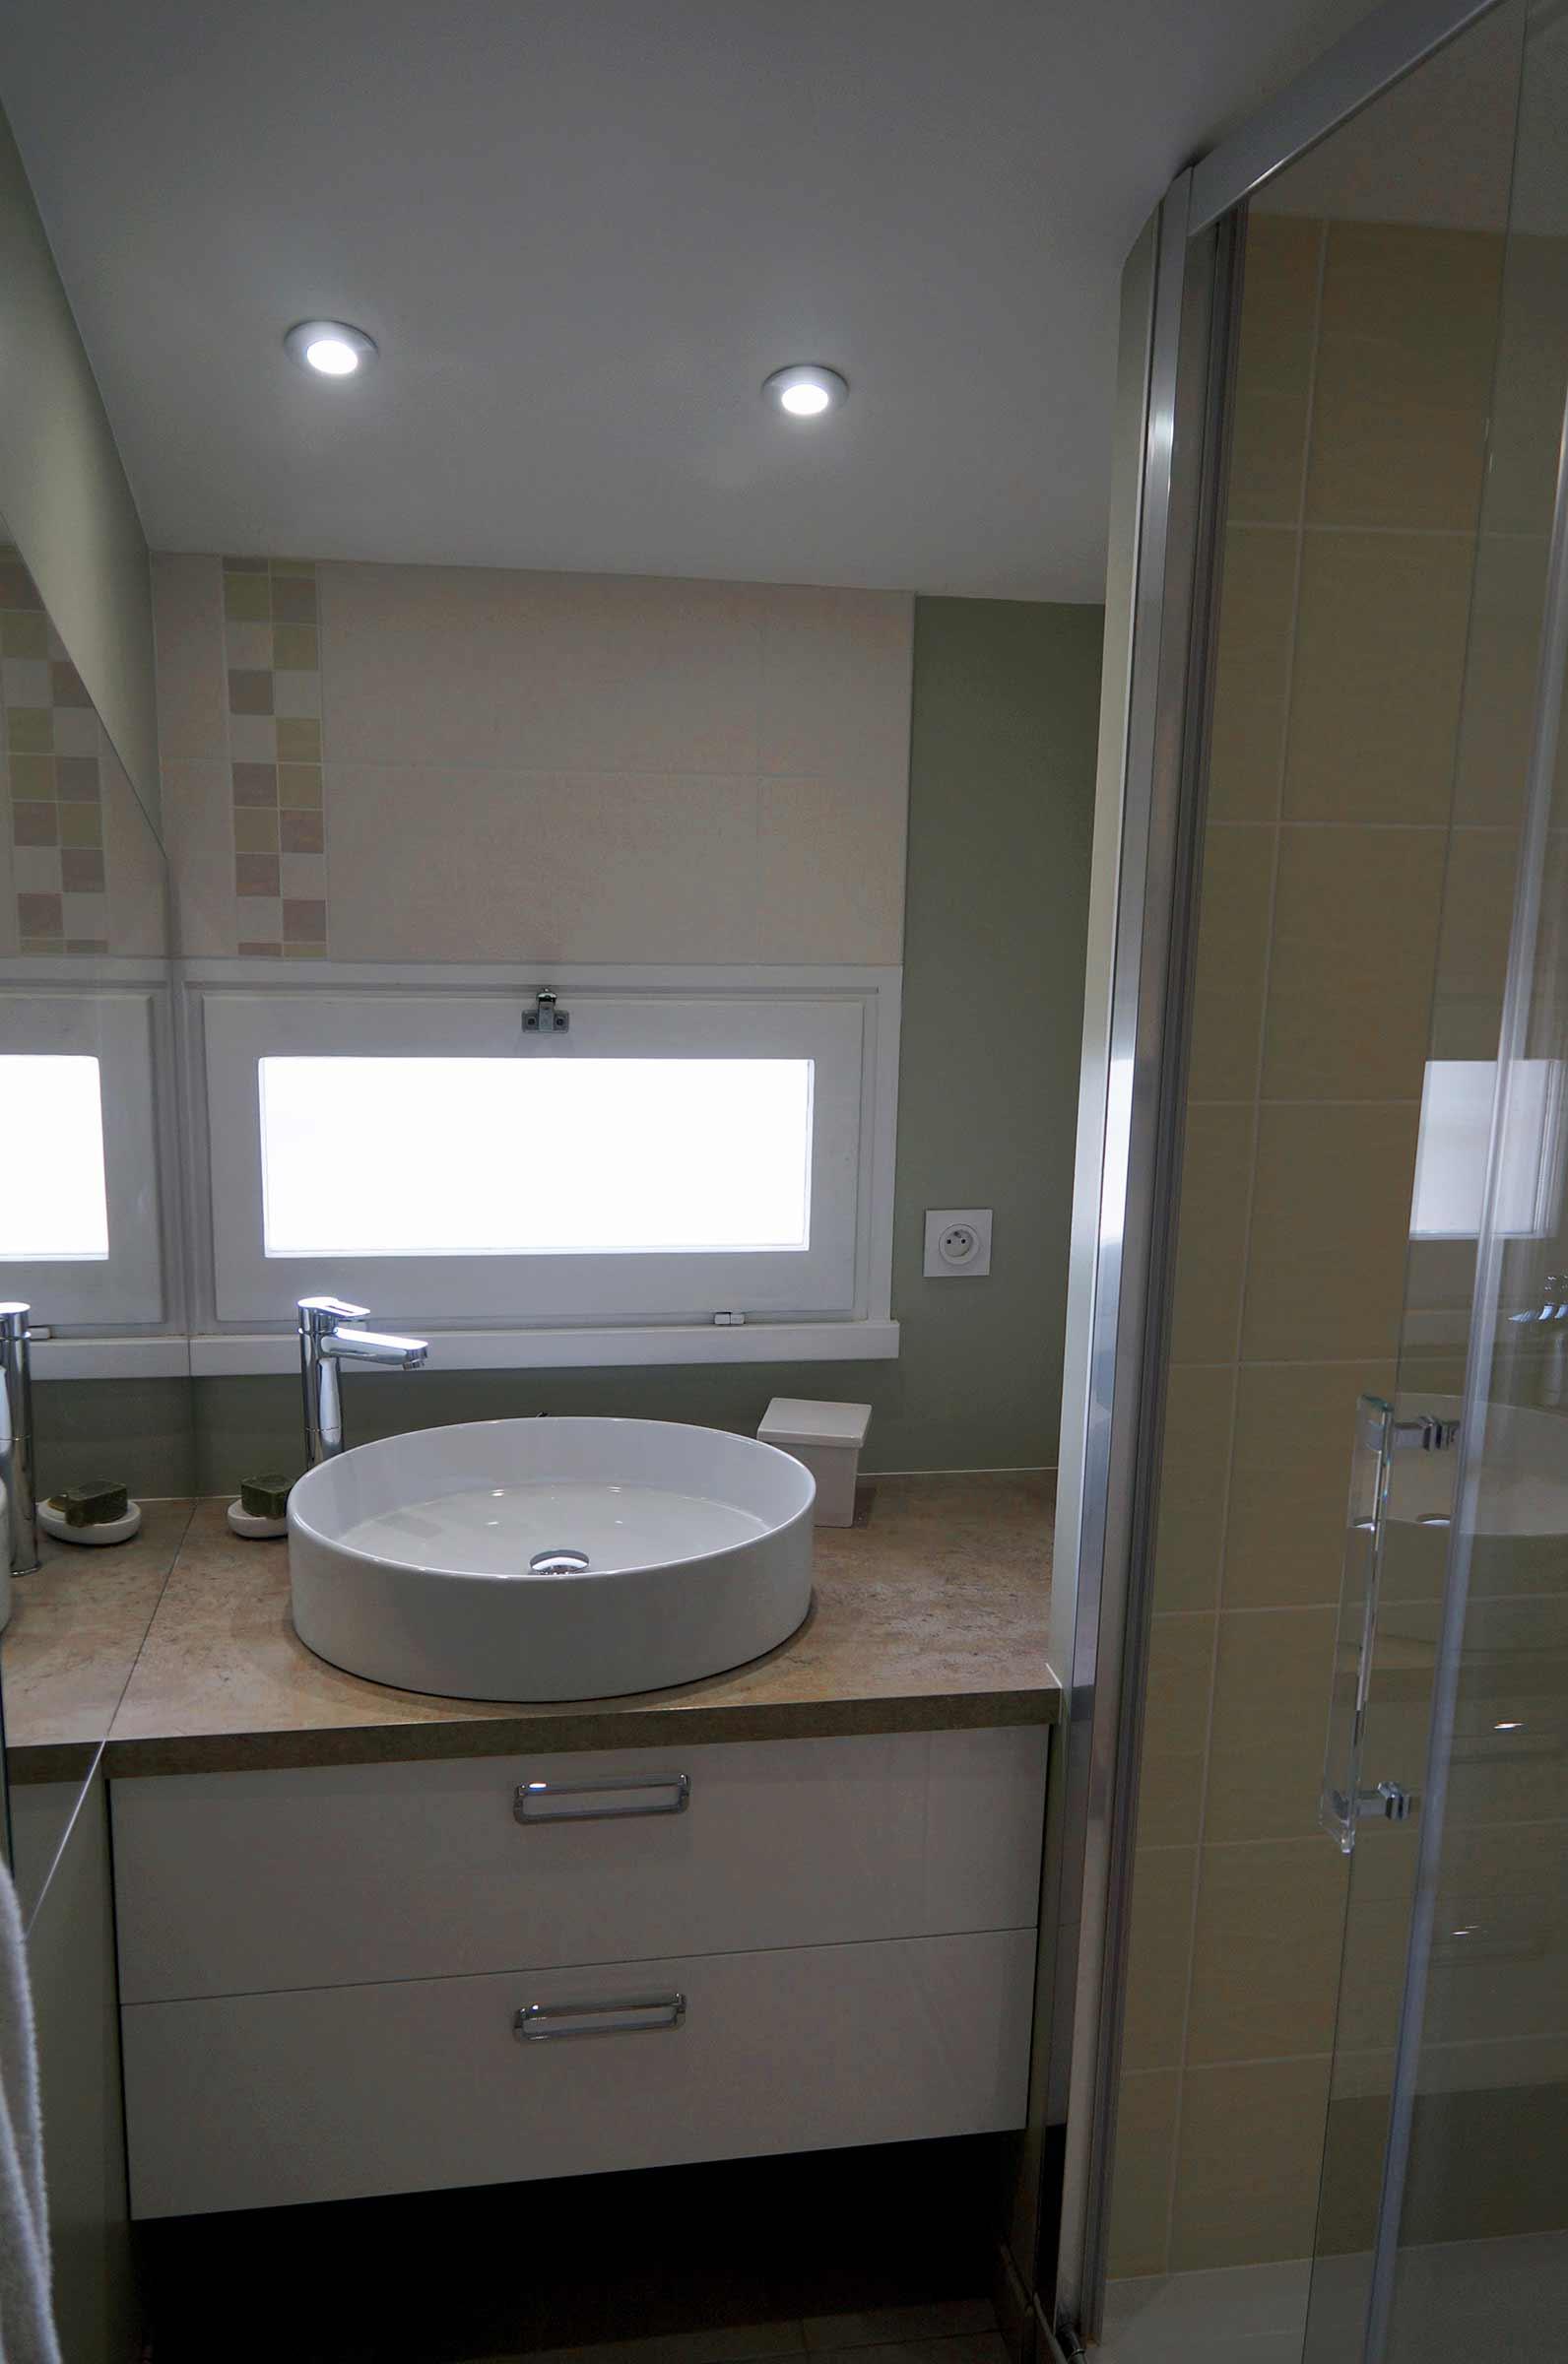 salle-de-bain-petite-piece-lavabo-vasque-a-poser - Ar Interieur